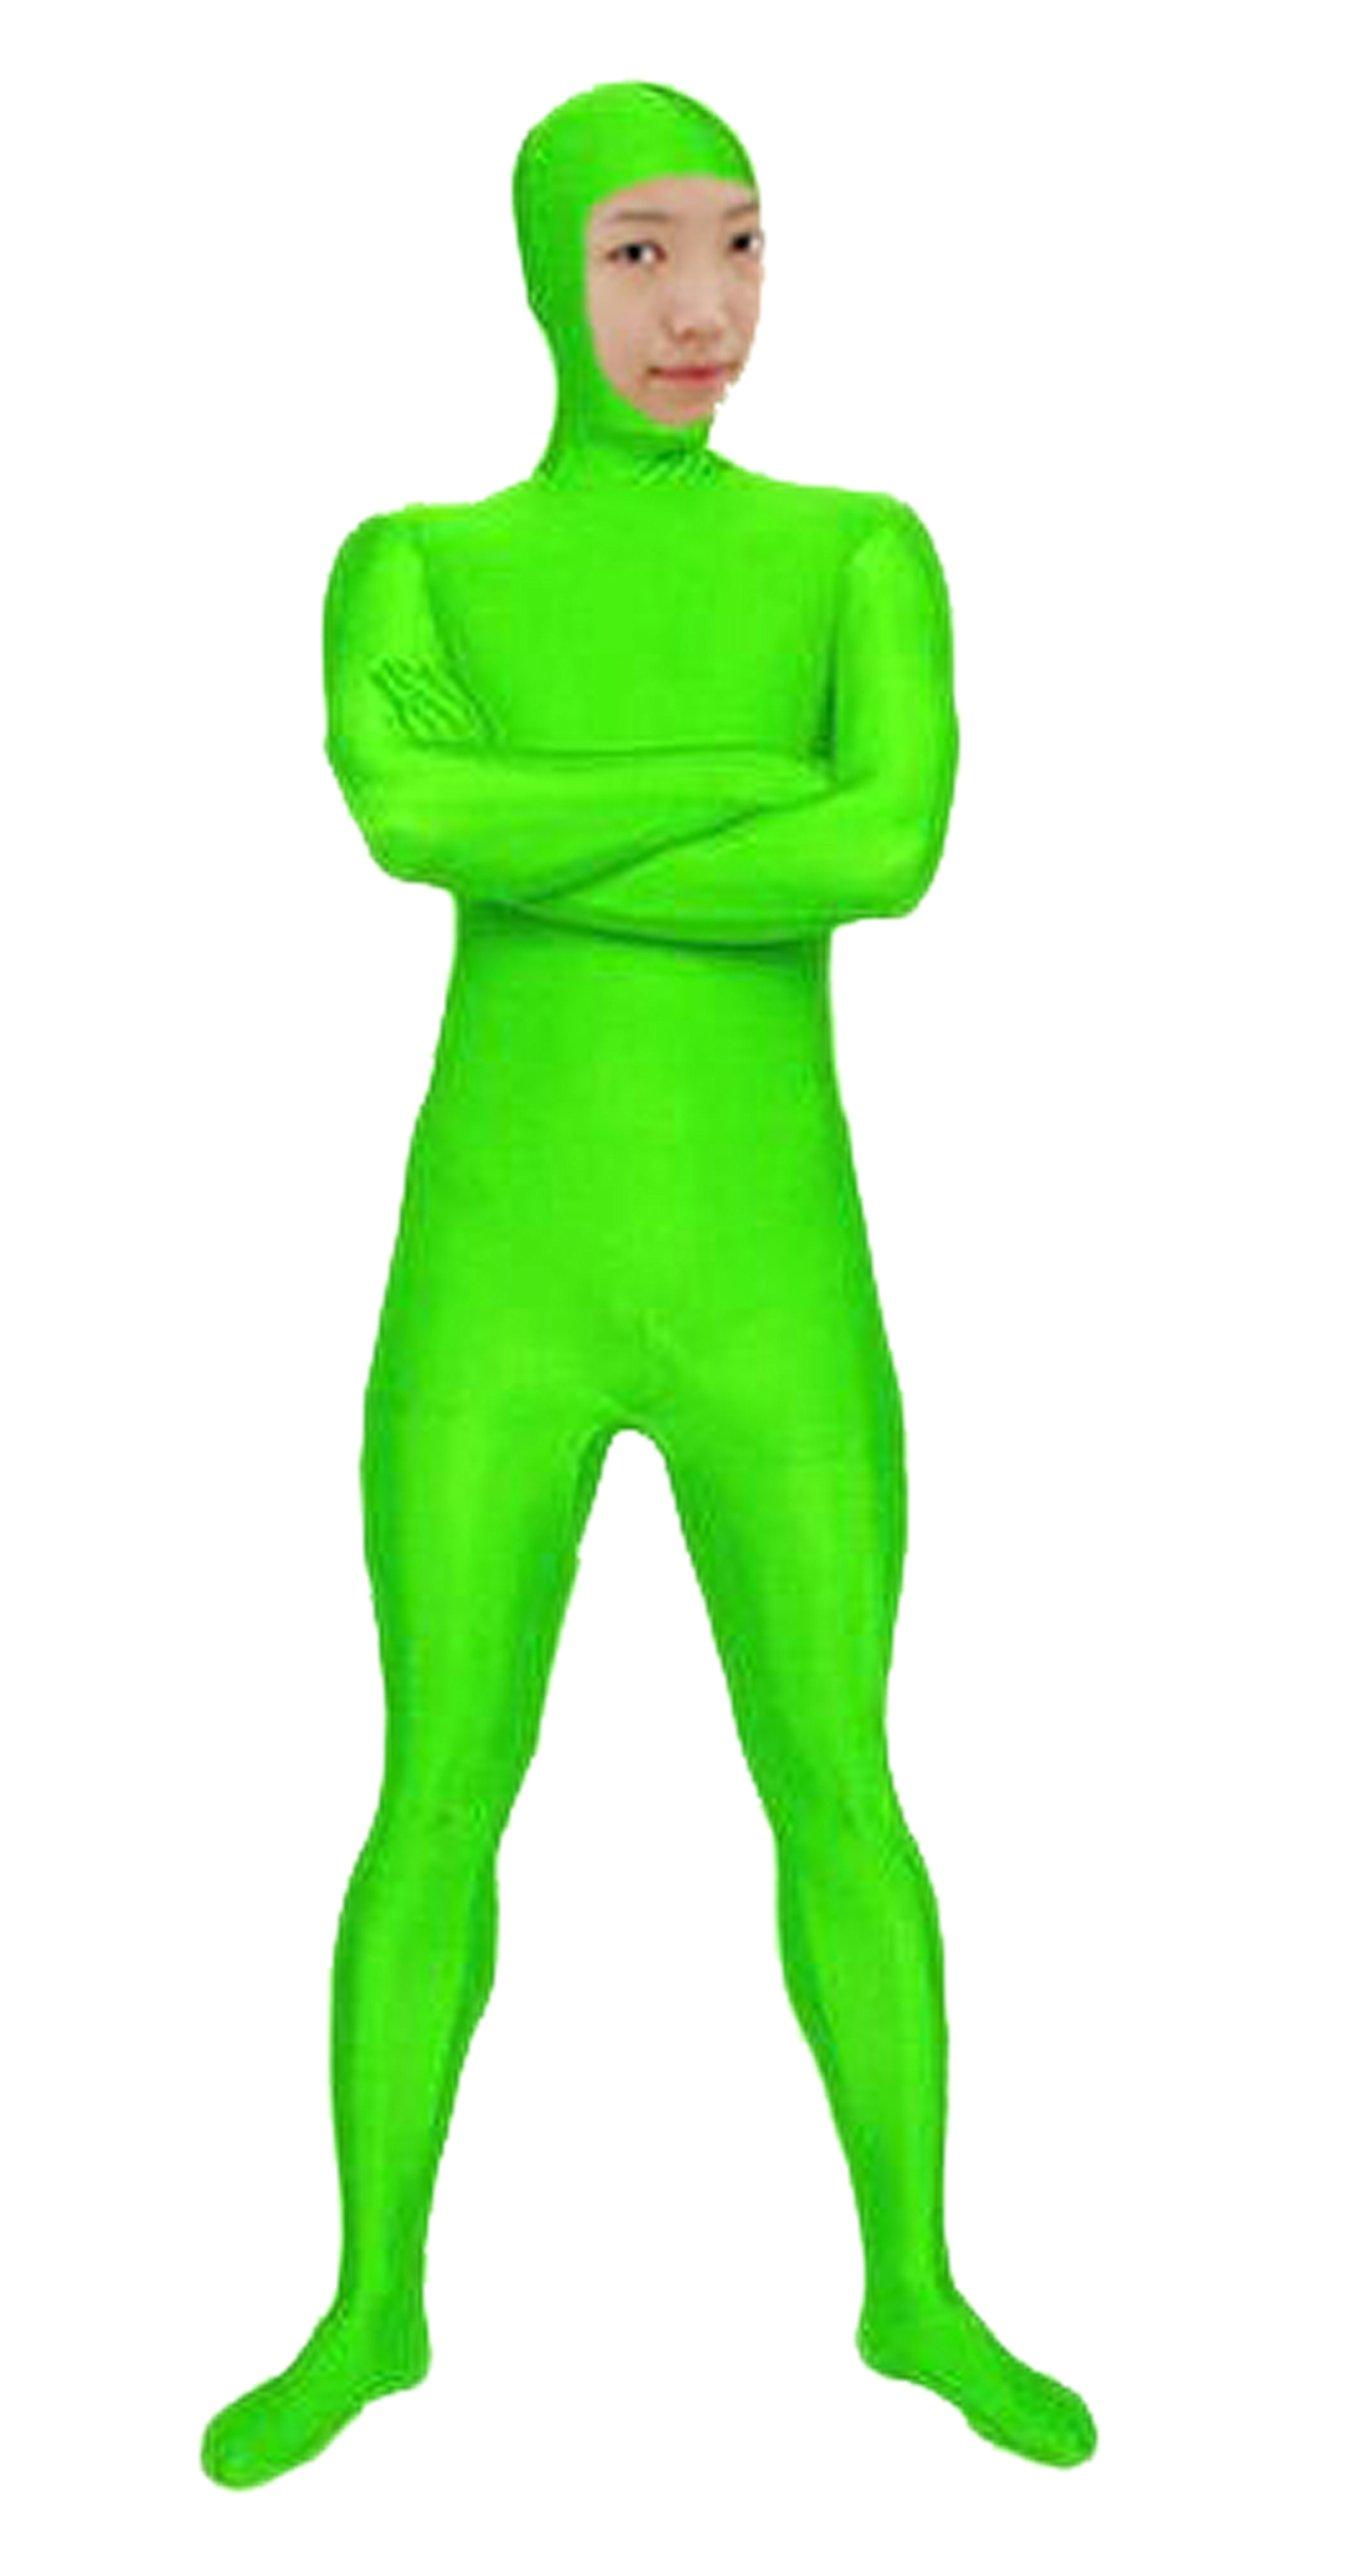 Seeksimle Unisex Green Zentai Full Bodysuit Lime Green